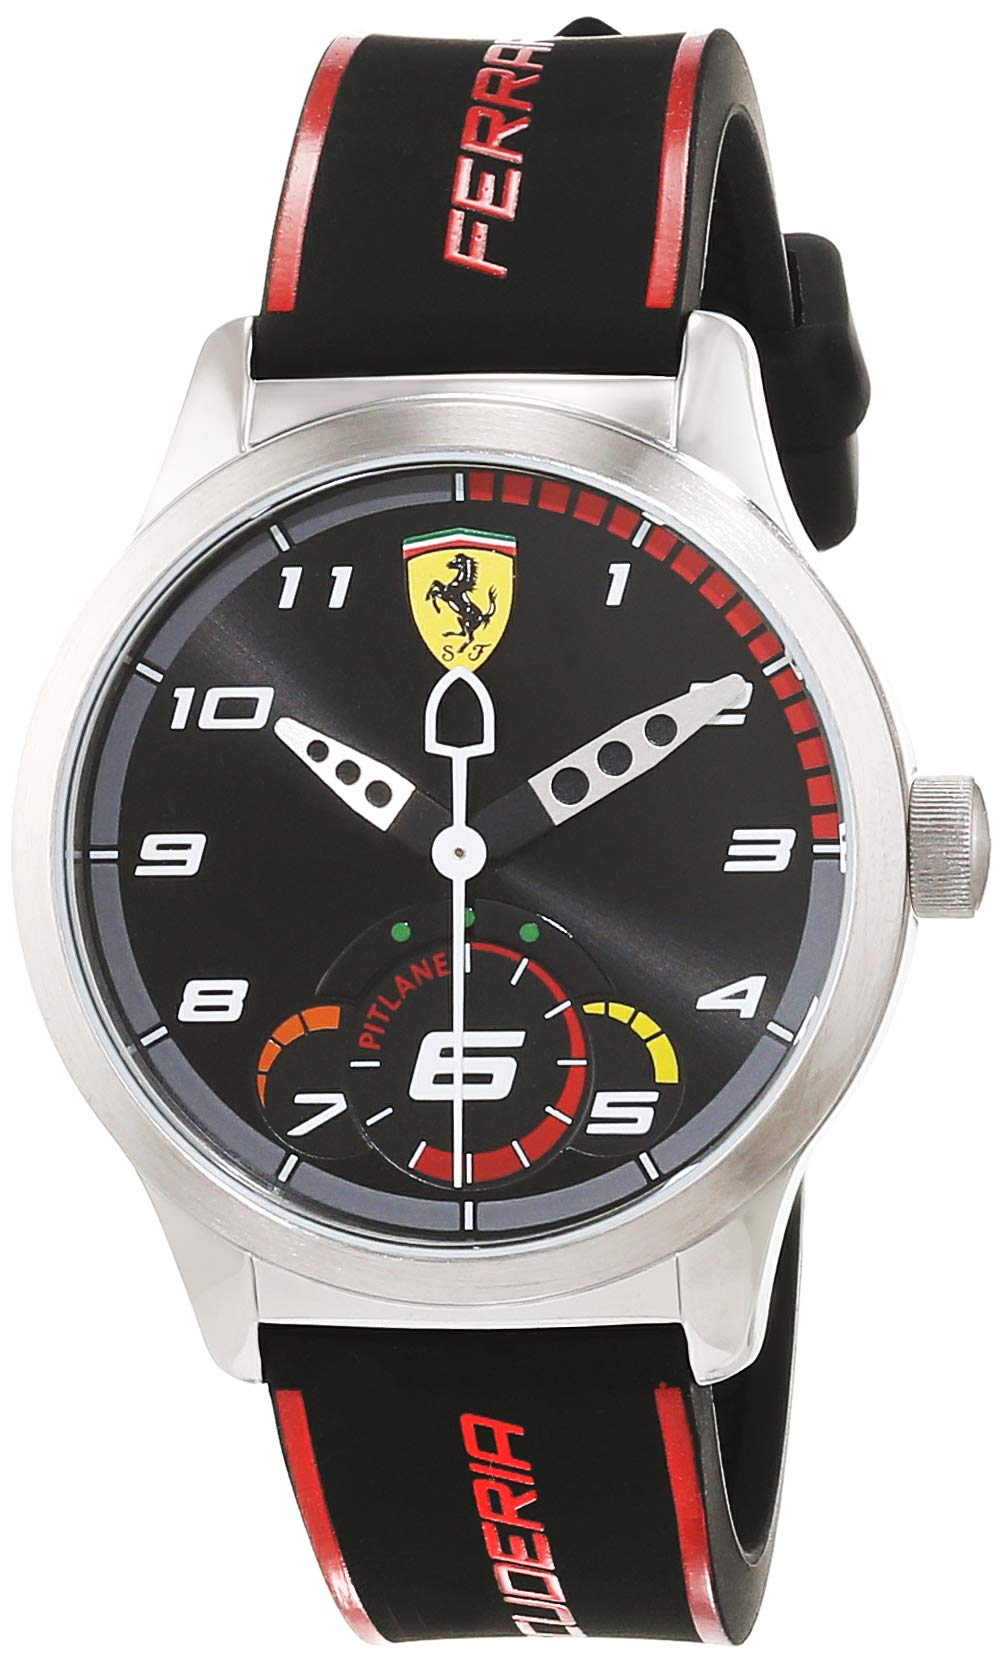 Scuderia Ferrari Reloj de pulsera Analógico Para Unisex Niños de Cuarzo con Correa en Silicona 860003